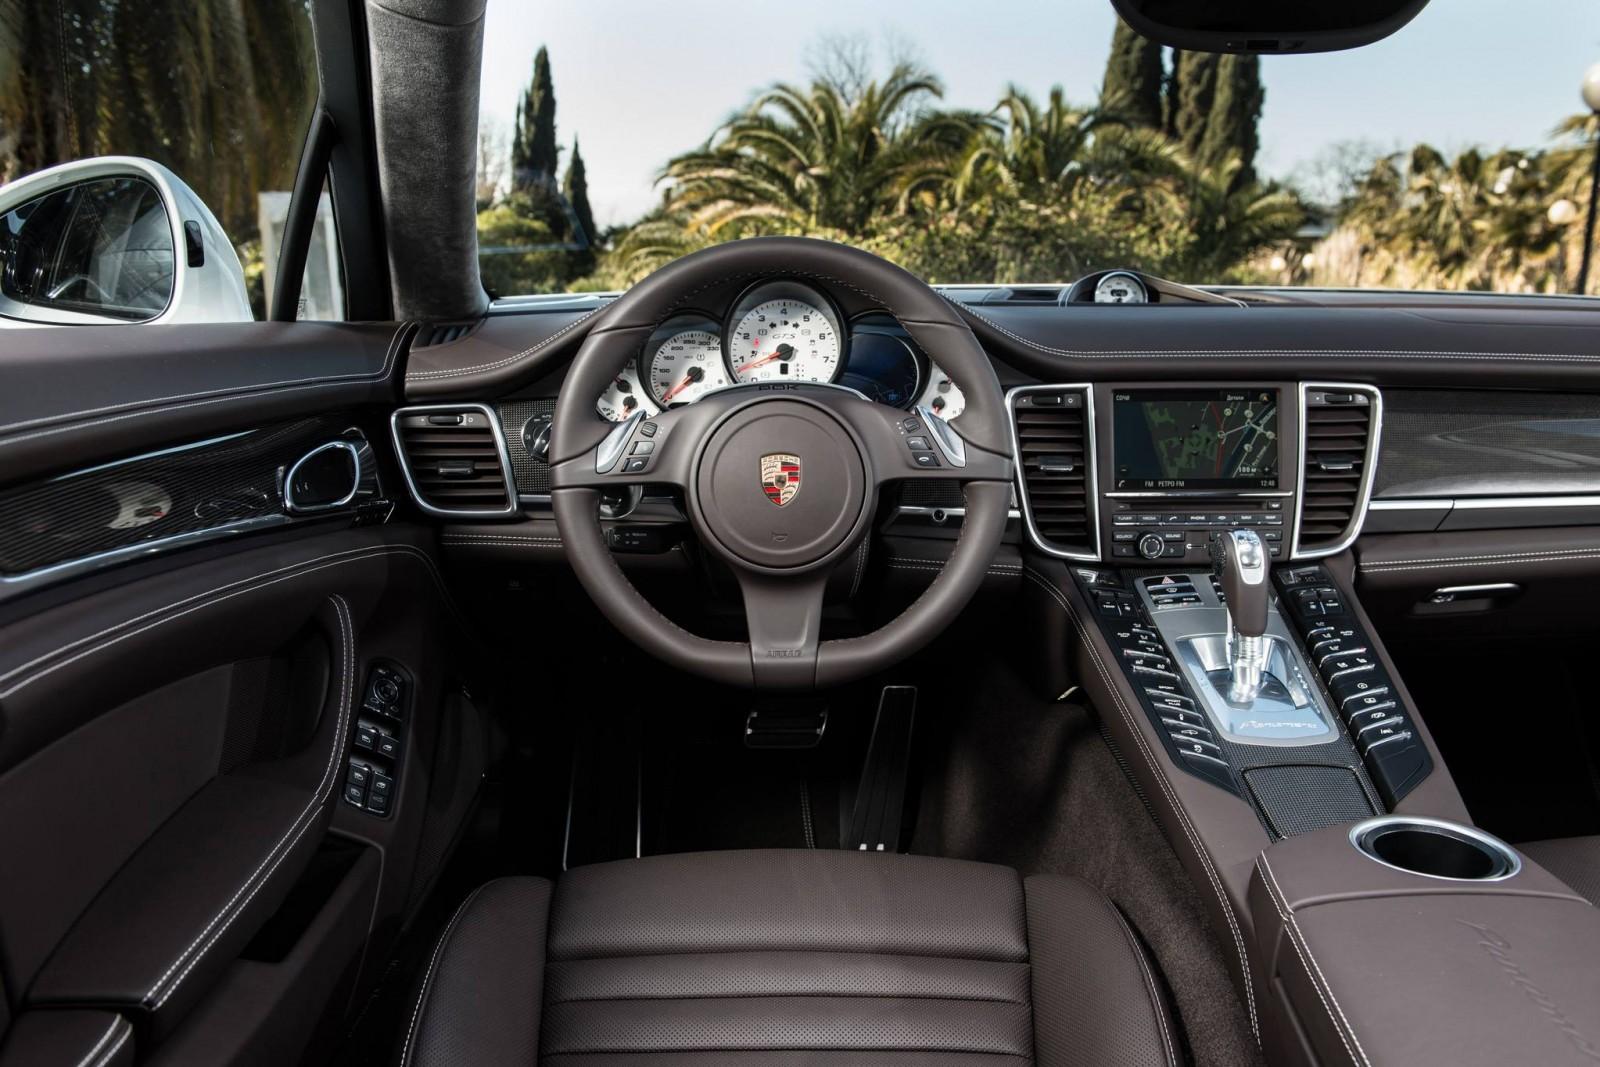 Gallery Post Alpha - Maria Sharapova Rocking Gorgeous 2014 Porsche Panamera GTS 2